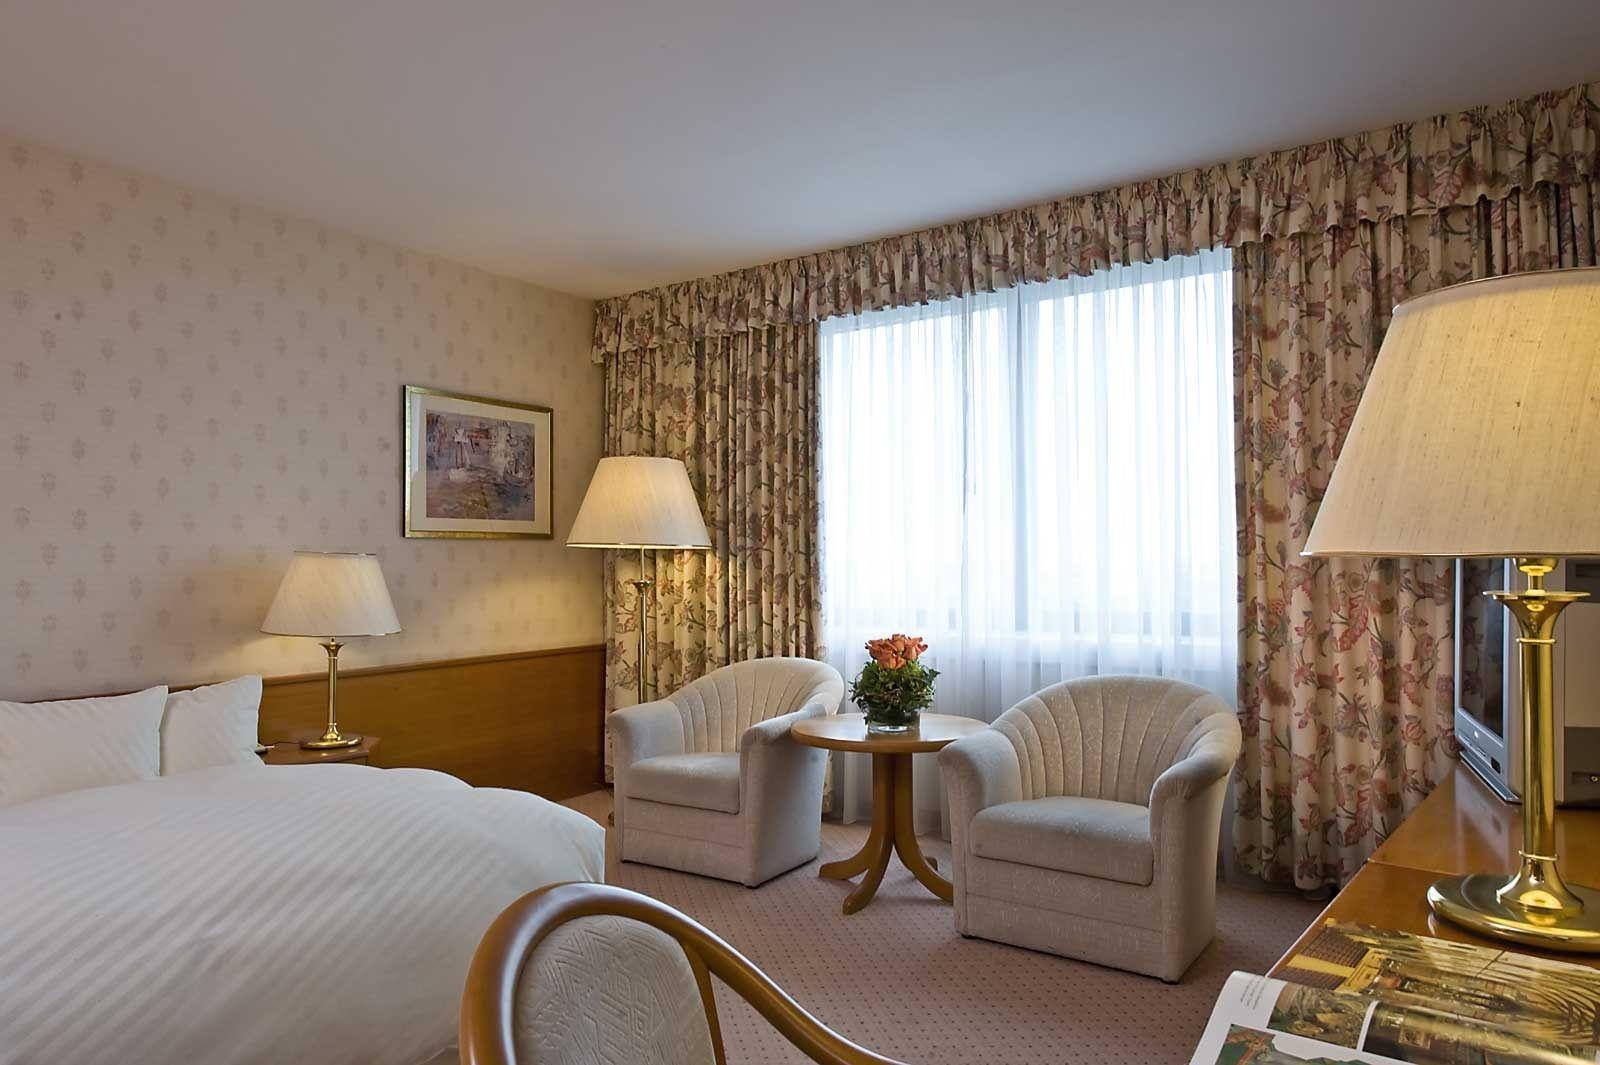 Maritim Ulm Timmendorfer Strand Clubhotel Timmendorfer Strand Seehotel Titisee Mit Bildern Hotel Ulm Hotels Hotel